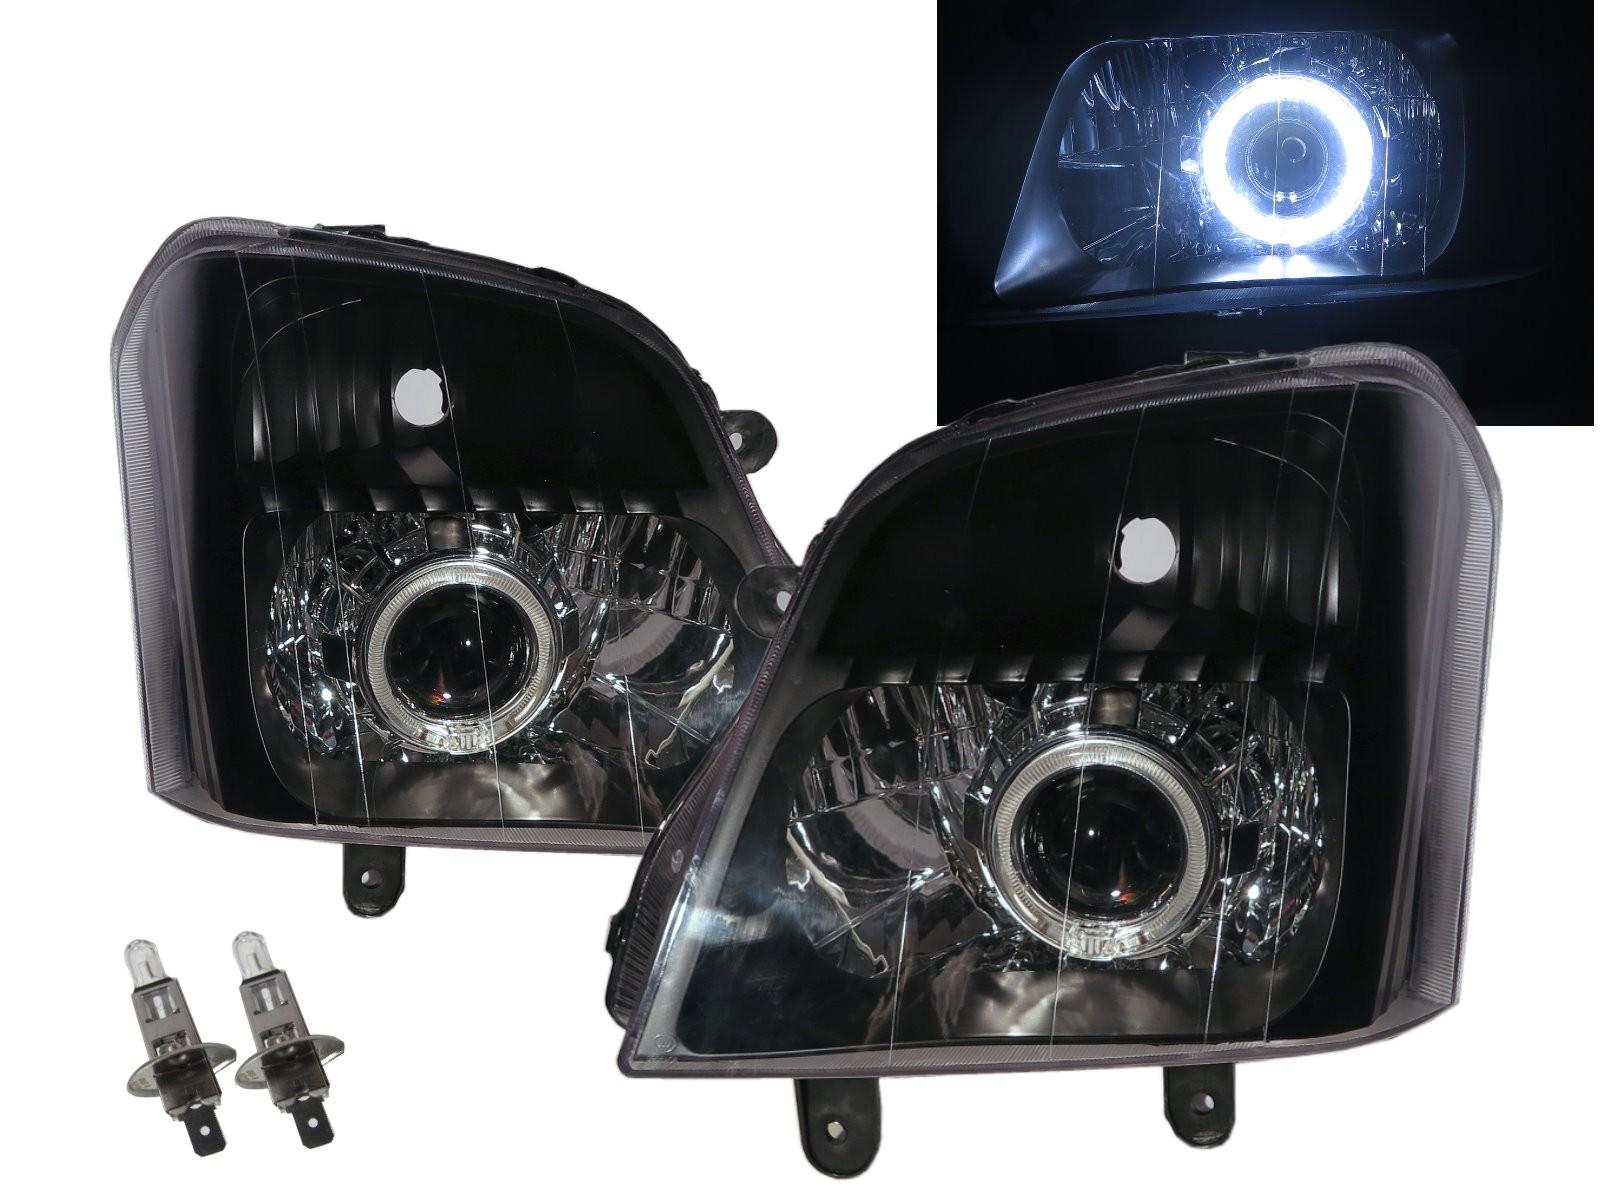 CrazyTheGod Explorer ll Second generation 2003-2010 Pickup 2D/4D Guide LED Angel-Eye Projector Headlight Headlamp Black for Foday RHD